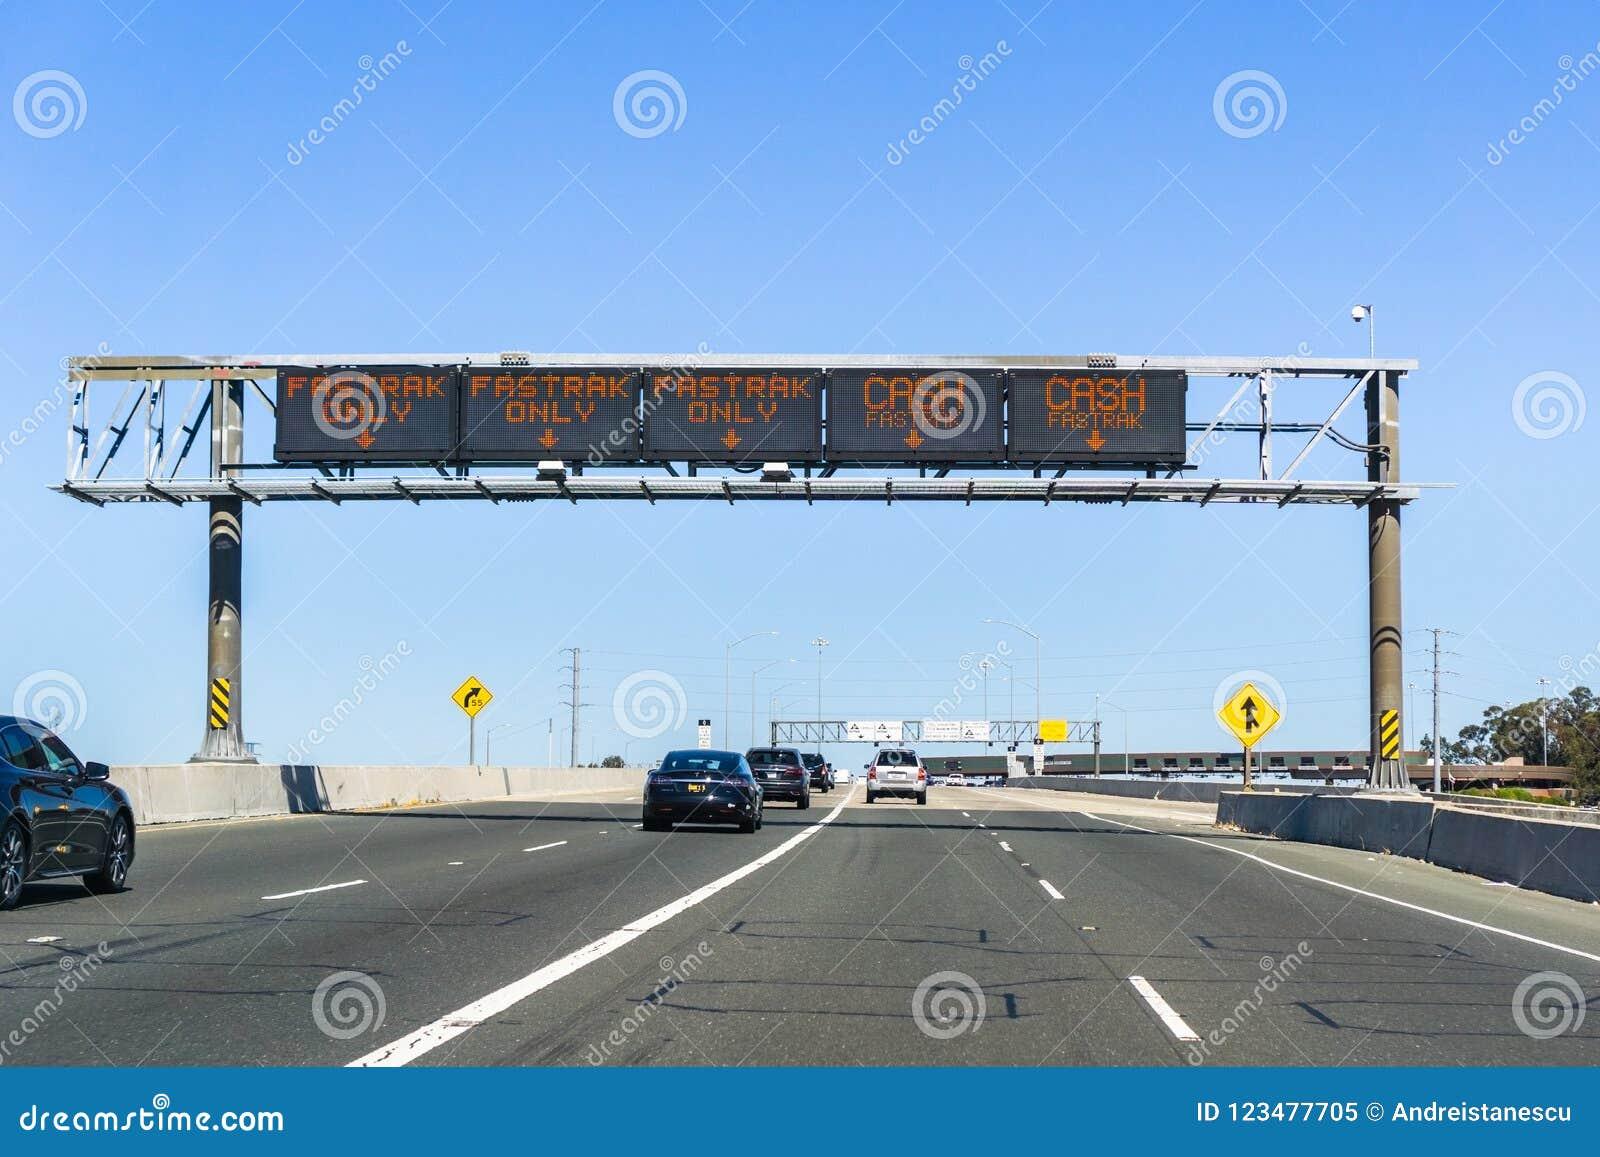 Traffic Lanes Designation Information Fastrak Or / And Cash